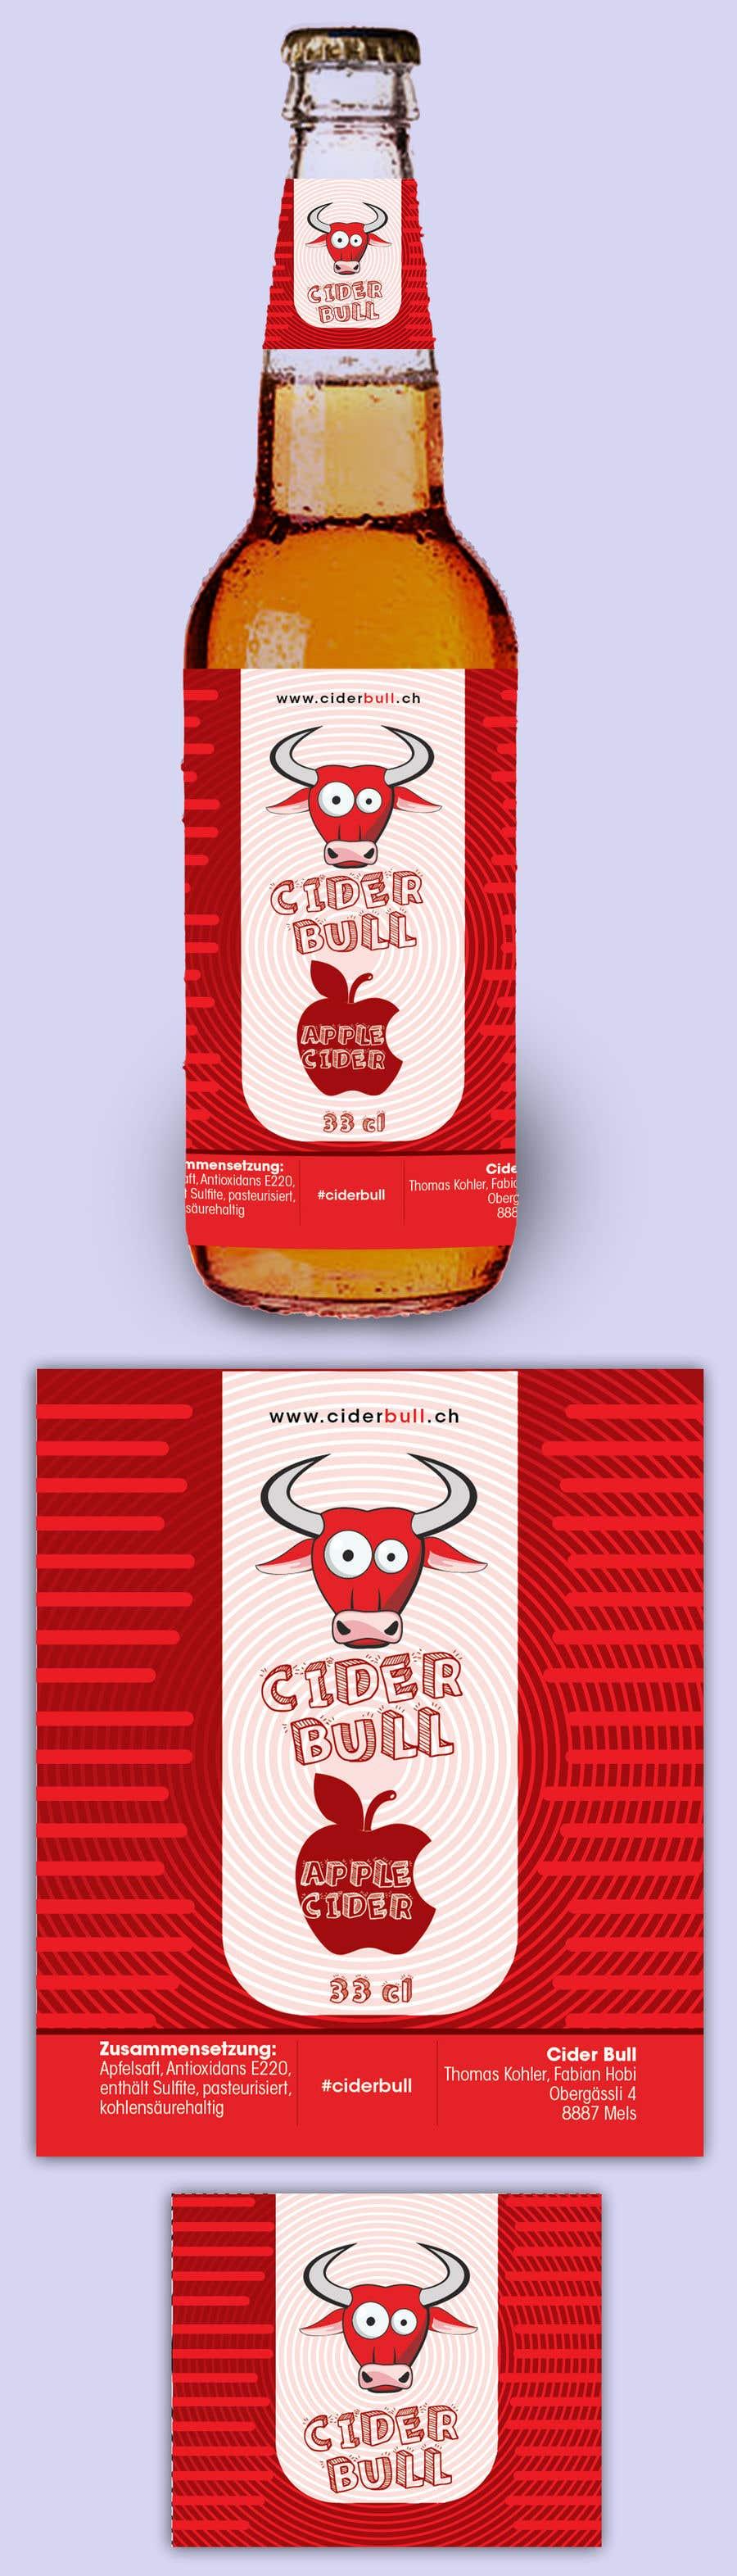 Kilpailutyö #28 kilpailussa Create a label for an apple cider beverage with different flavors